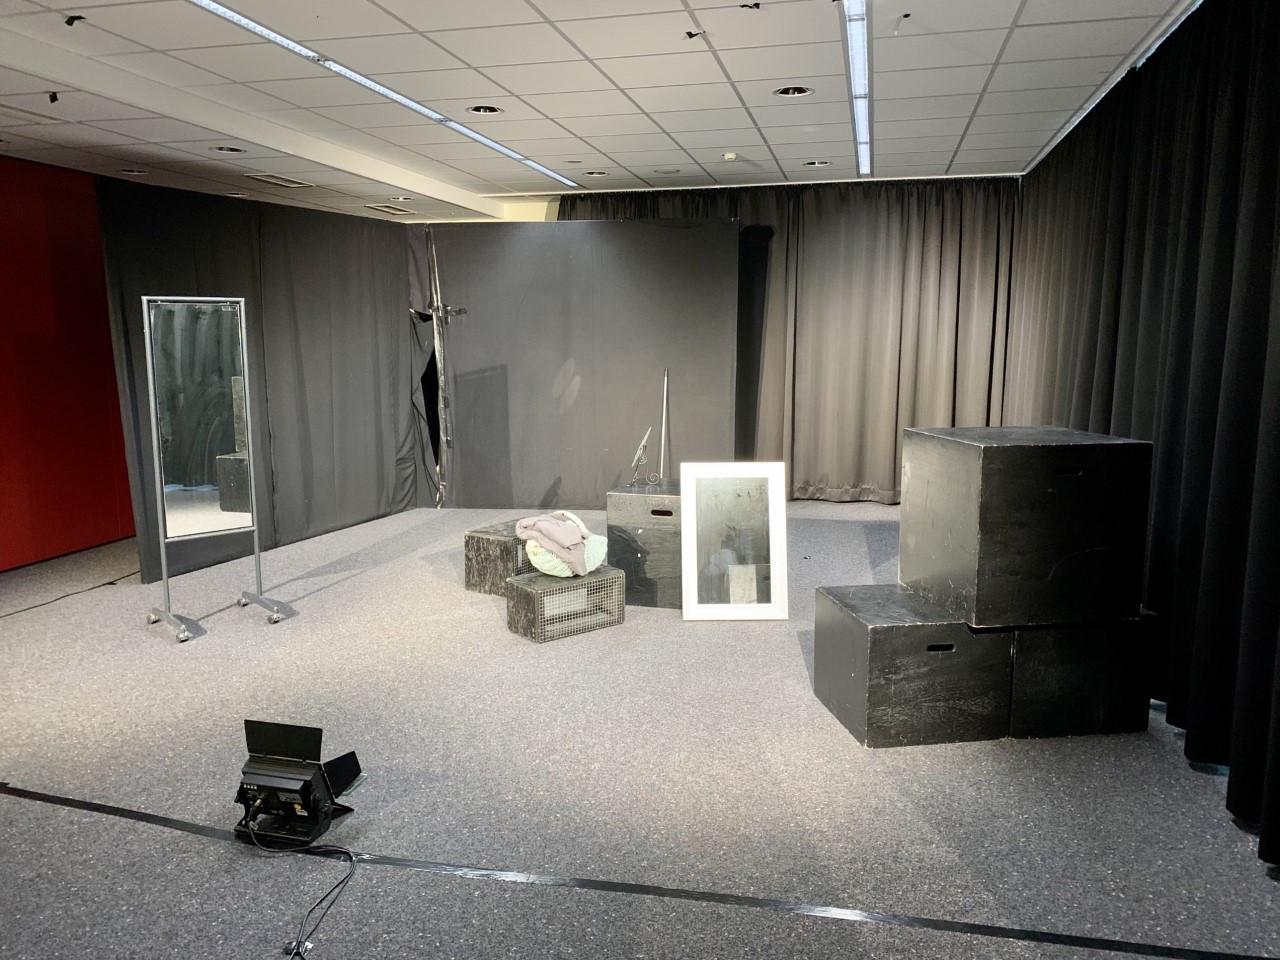 Bühnenraum_vor_Beginn